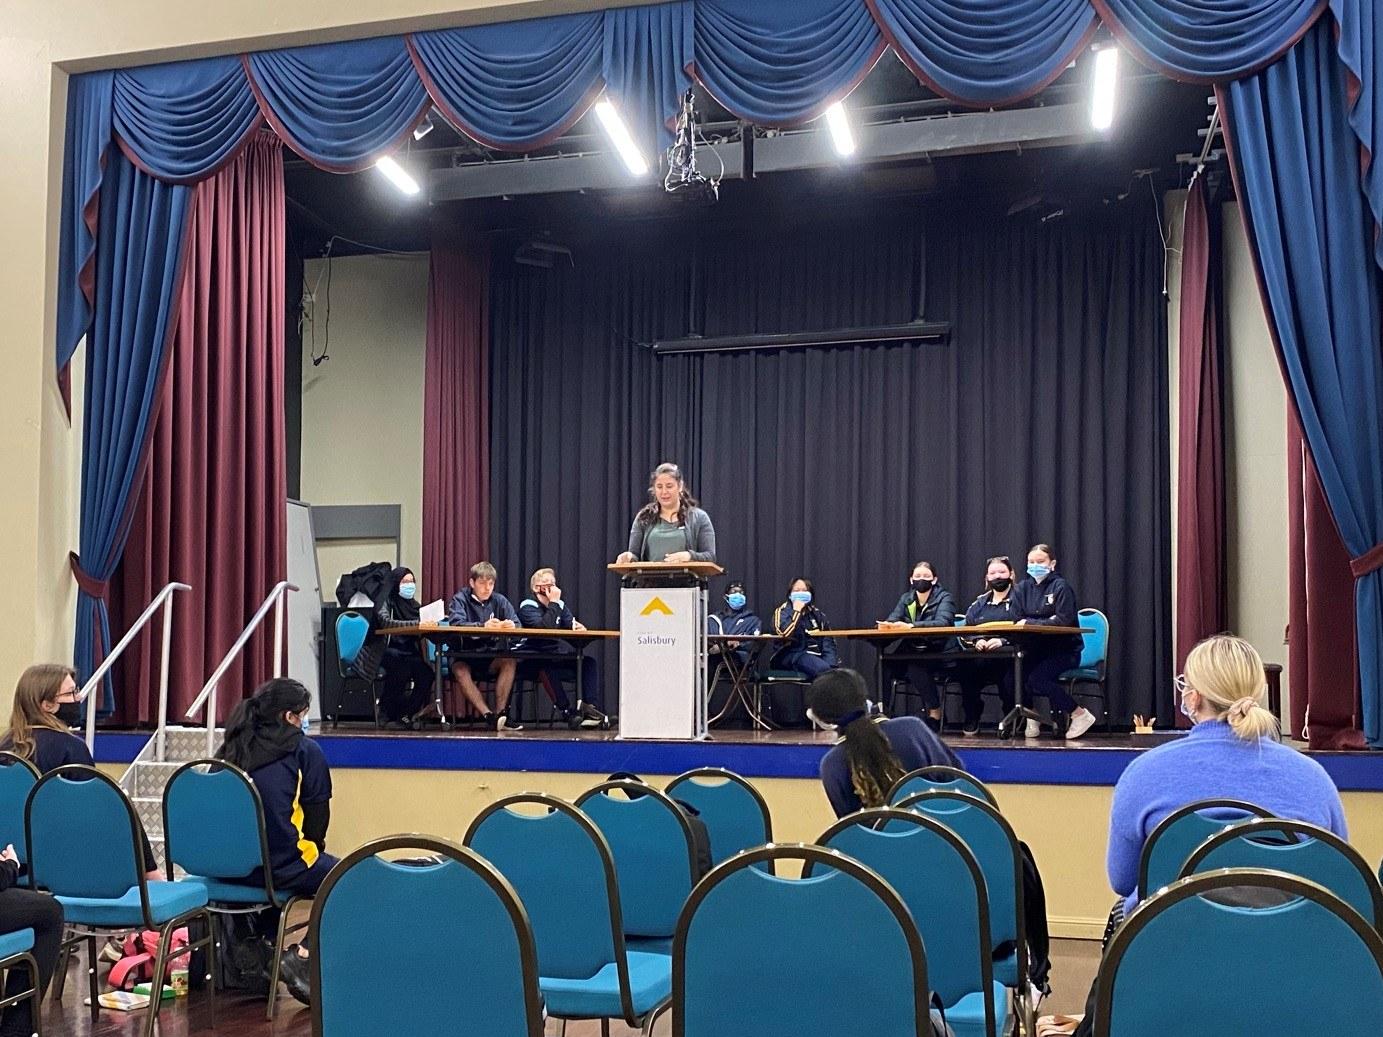 NASSSA-2021-Debating-Alana.jpeg#asset:2841